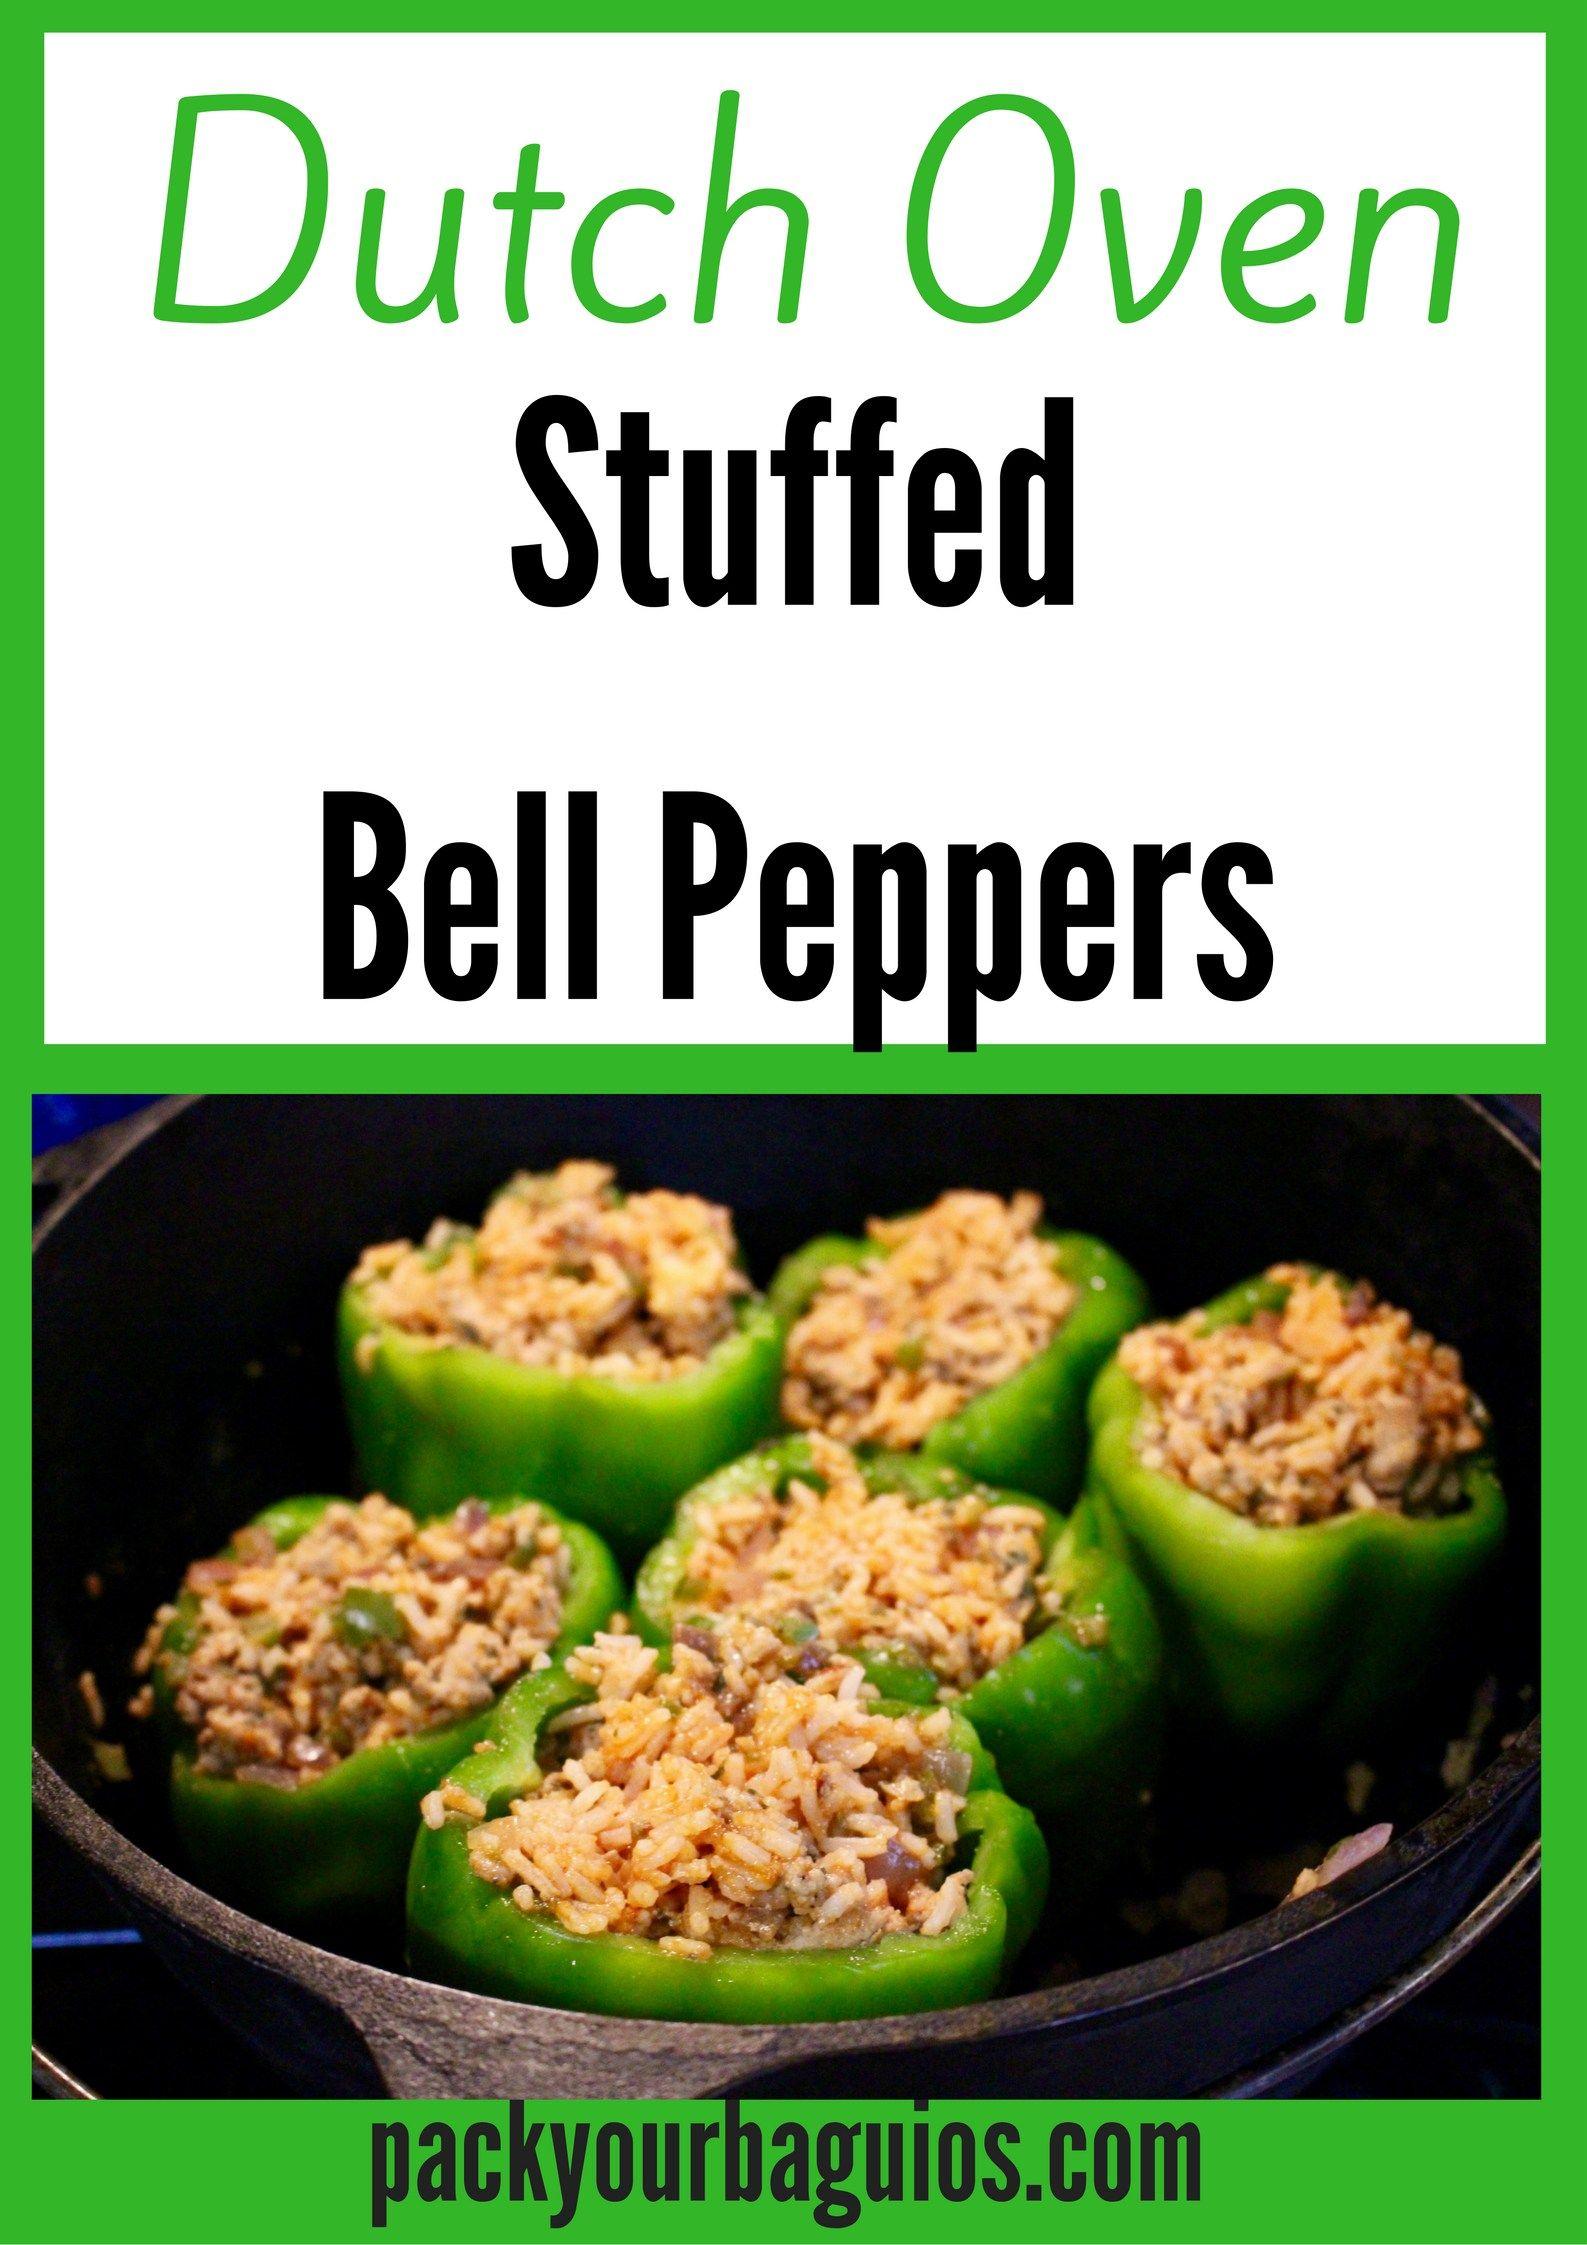 Stuffed Bell Peppers Dutch Oven Recipe Campfire Cooking Camping Stuffed Peppers Stuffed Bell Peppers Meals